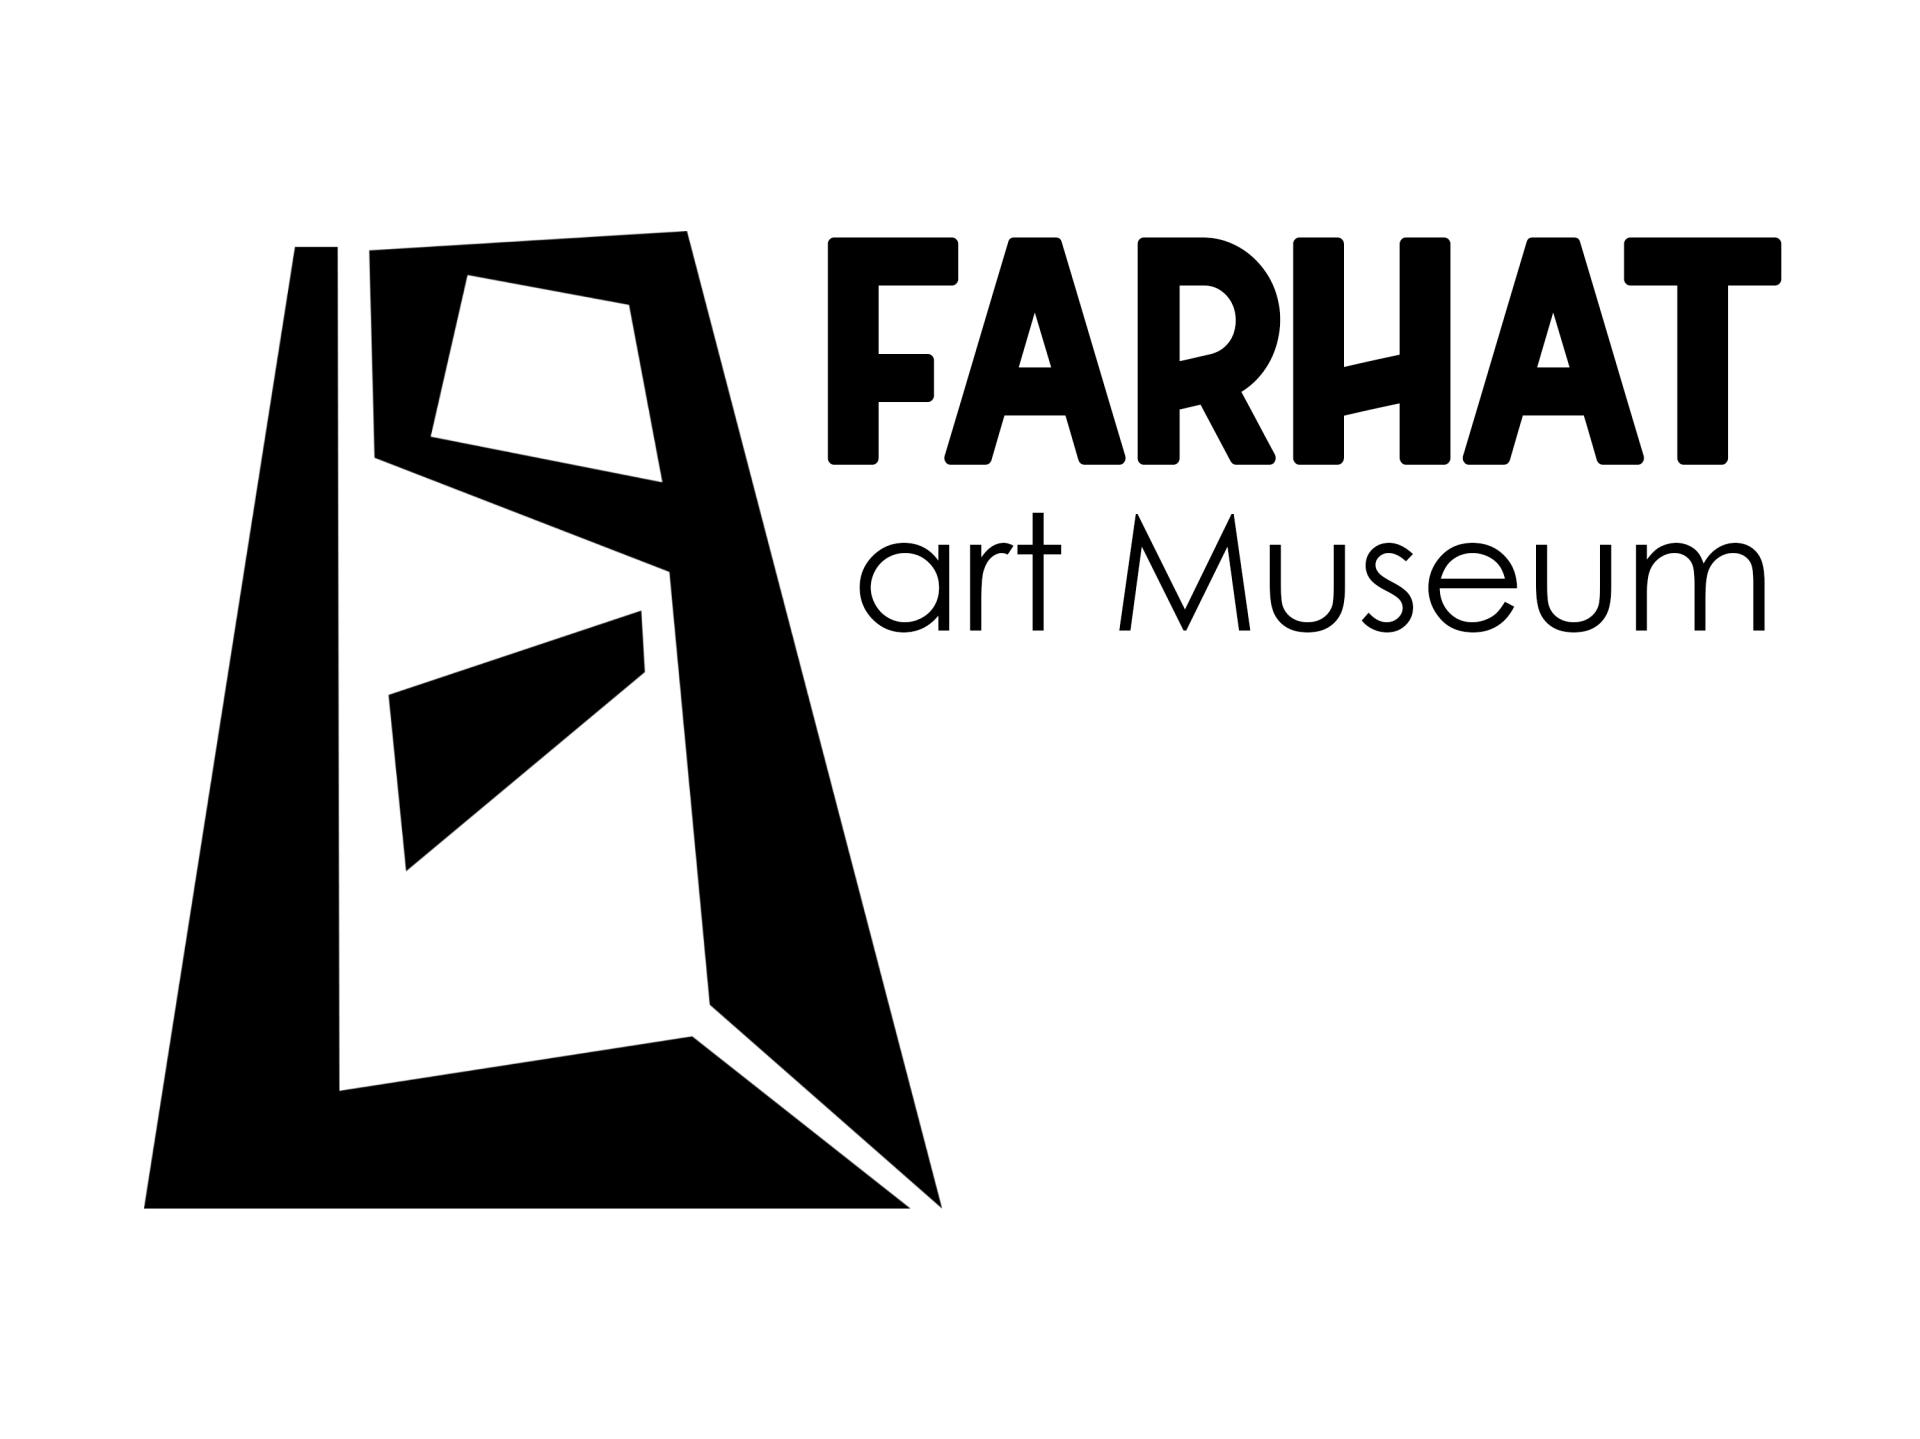 farhatartmuseum.org